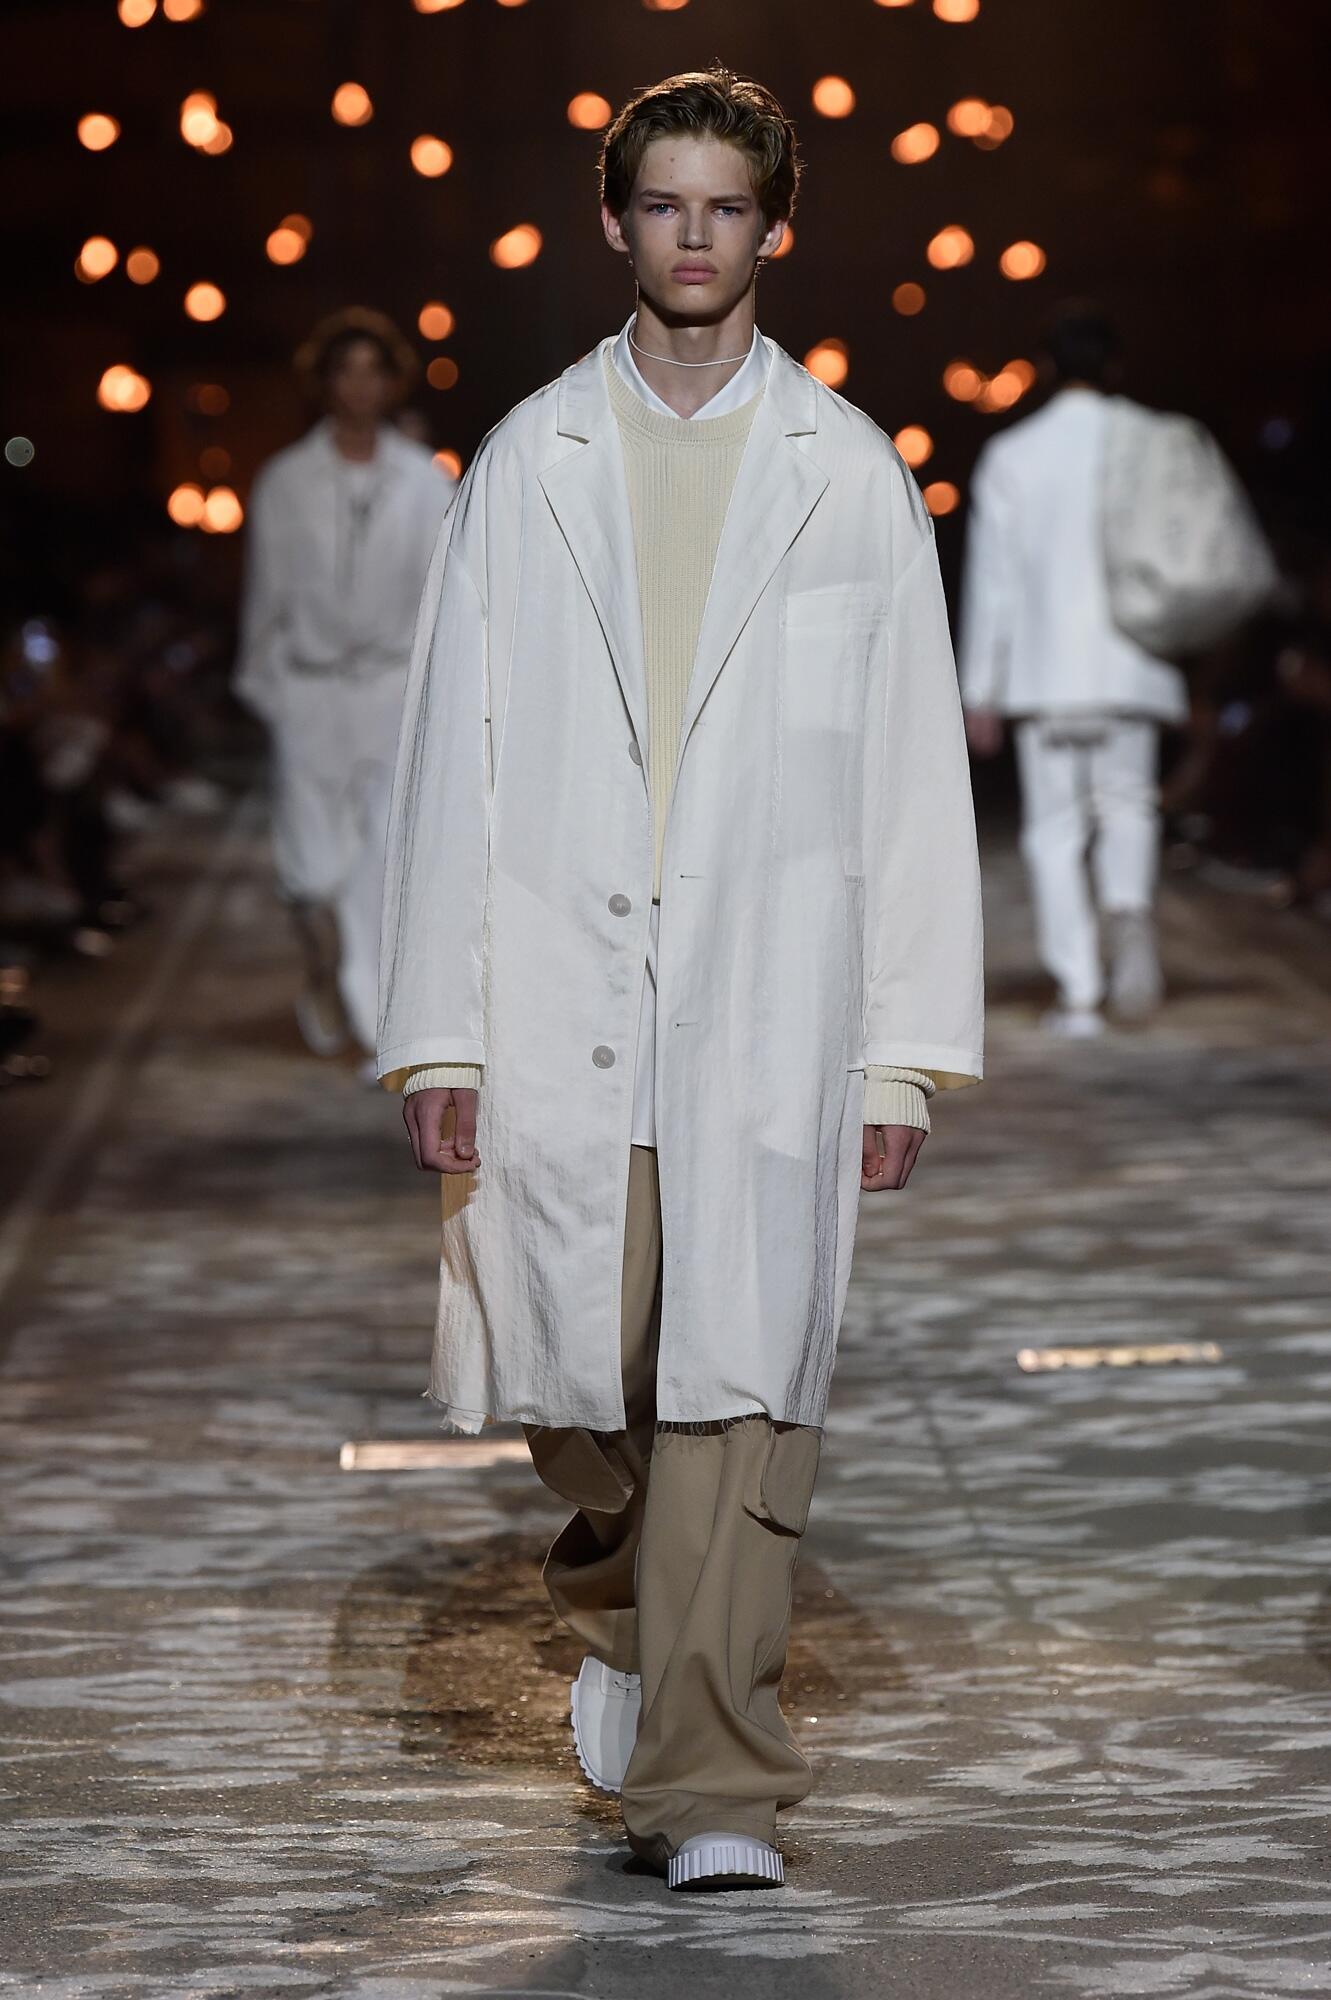 Man Model Fashion Show Hugo